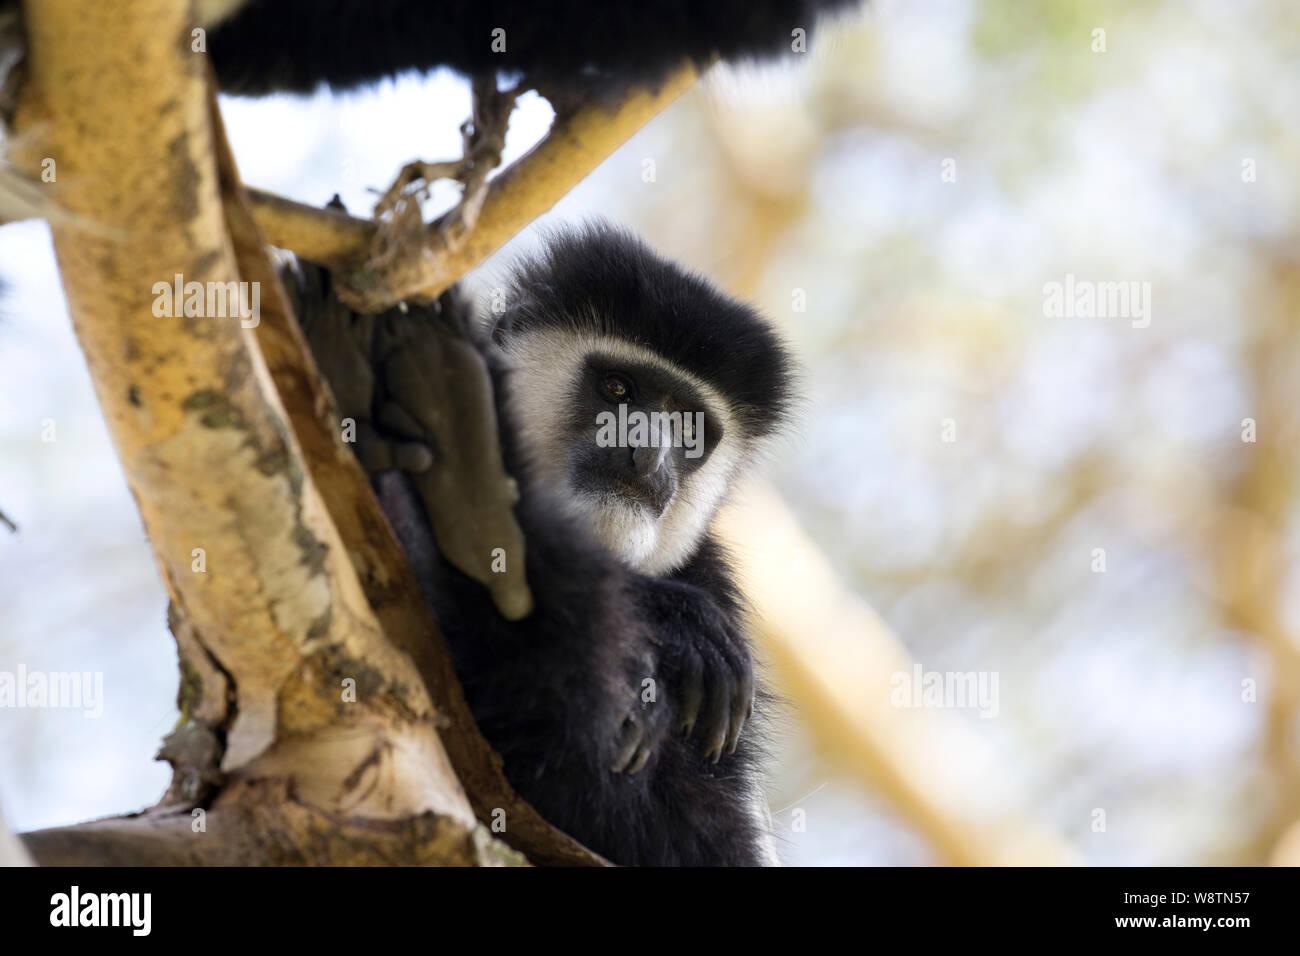 One Colobus monkey, Colobus guereza occidentalis, in Acacia tree, Elsamere, Kenya Stock Photo